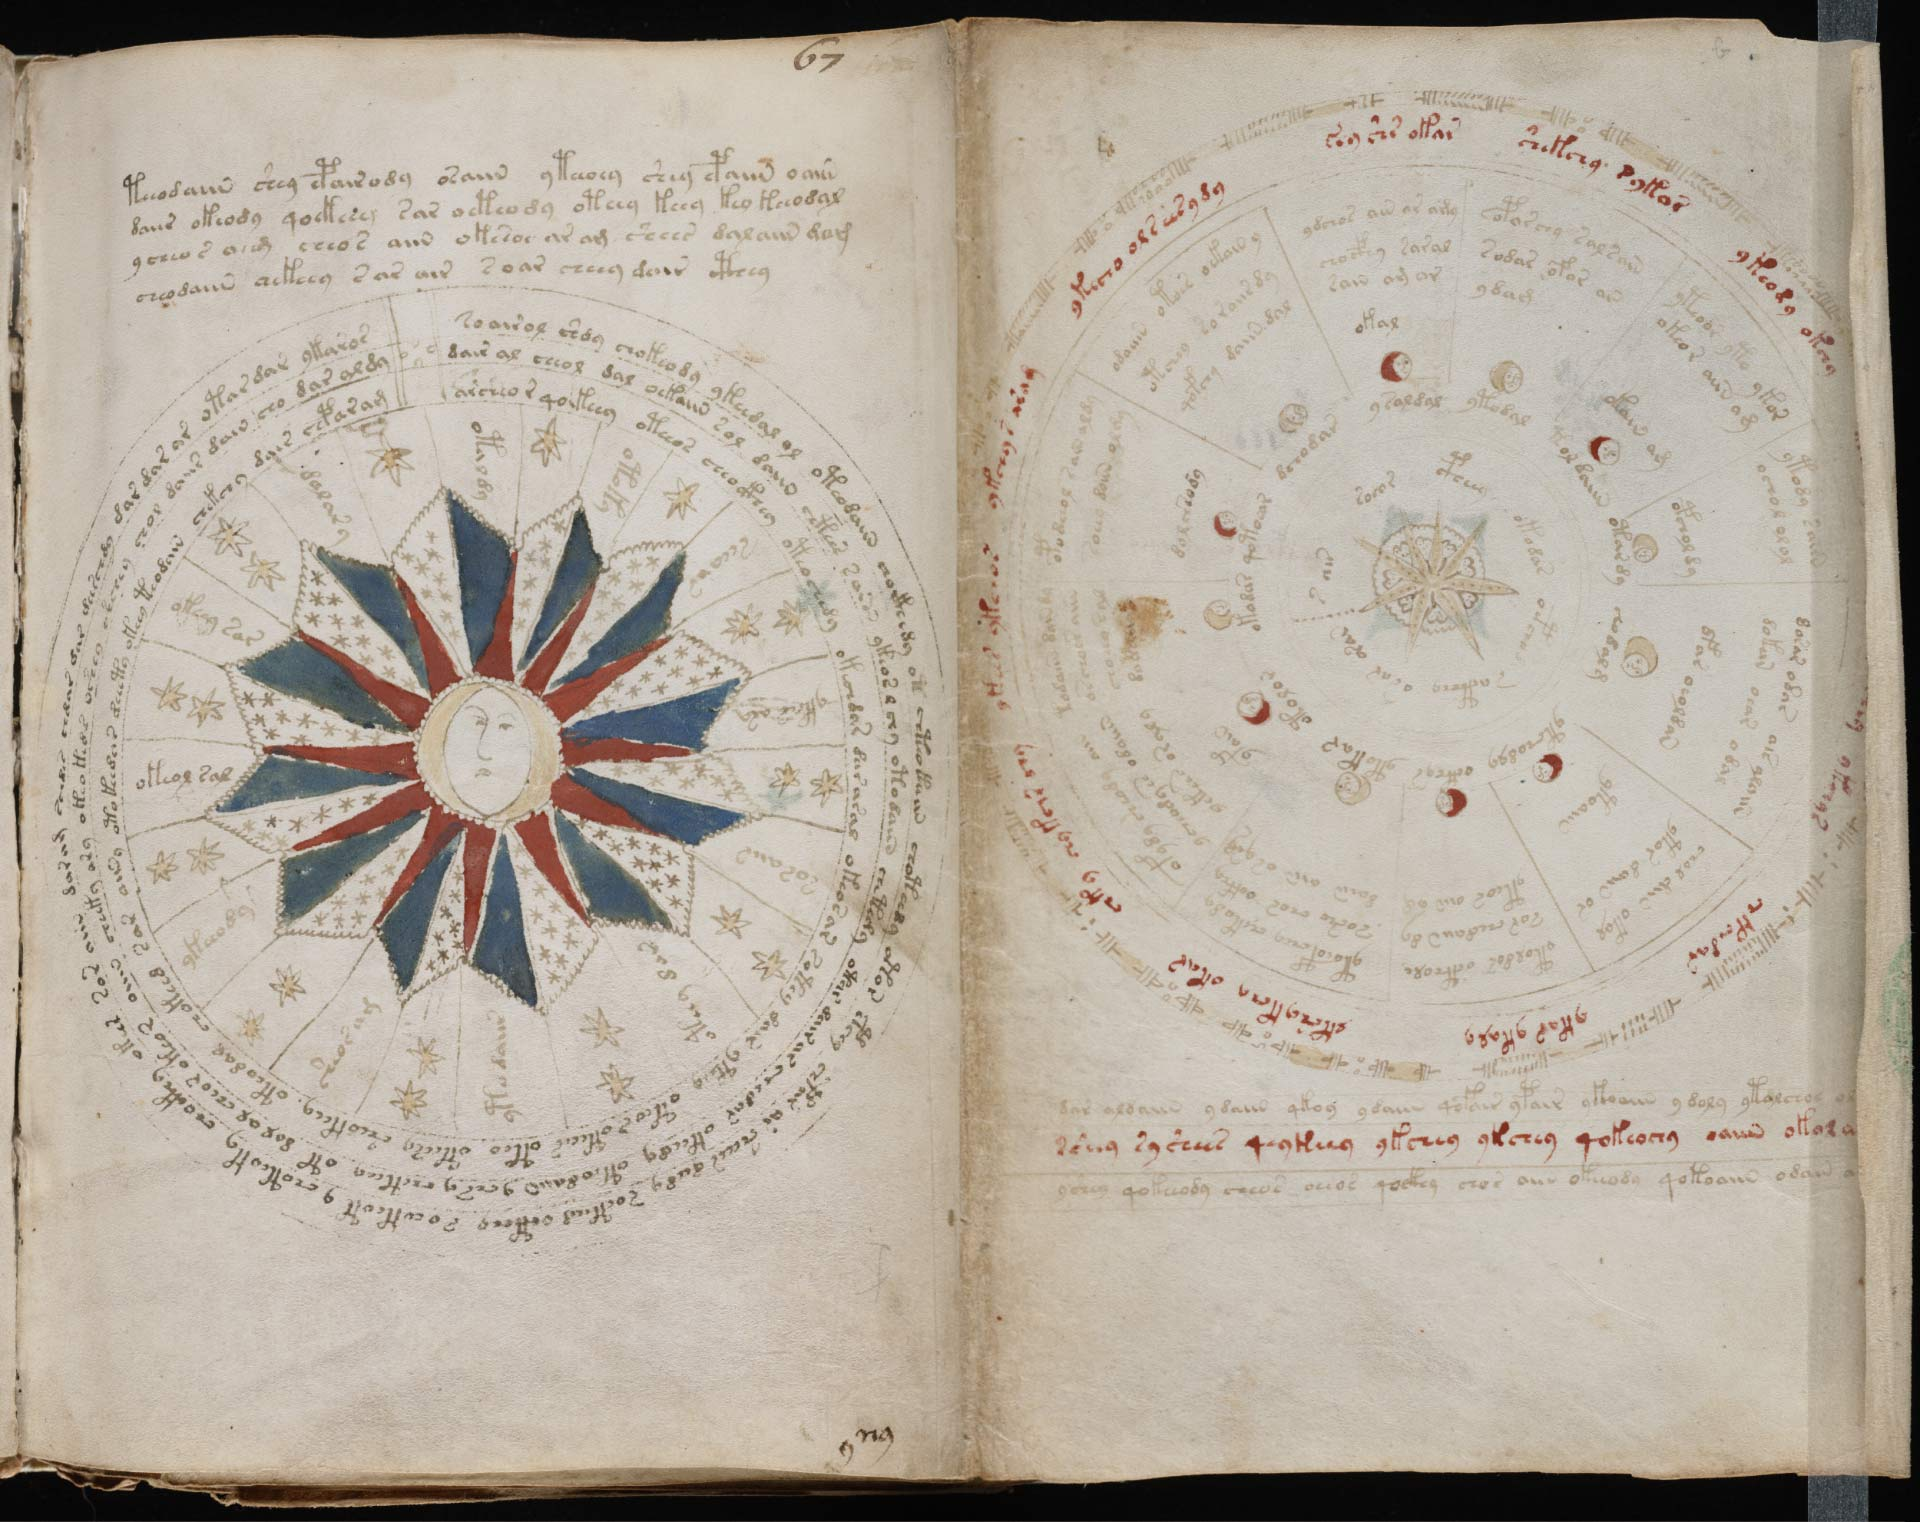 диплом астролога и астропсихолога